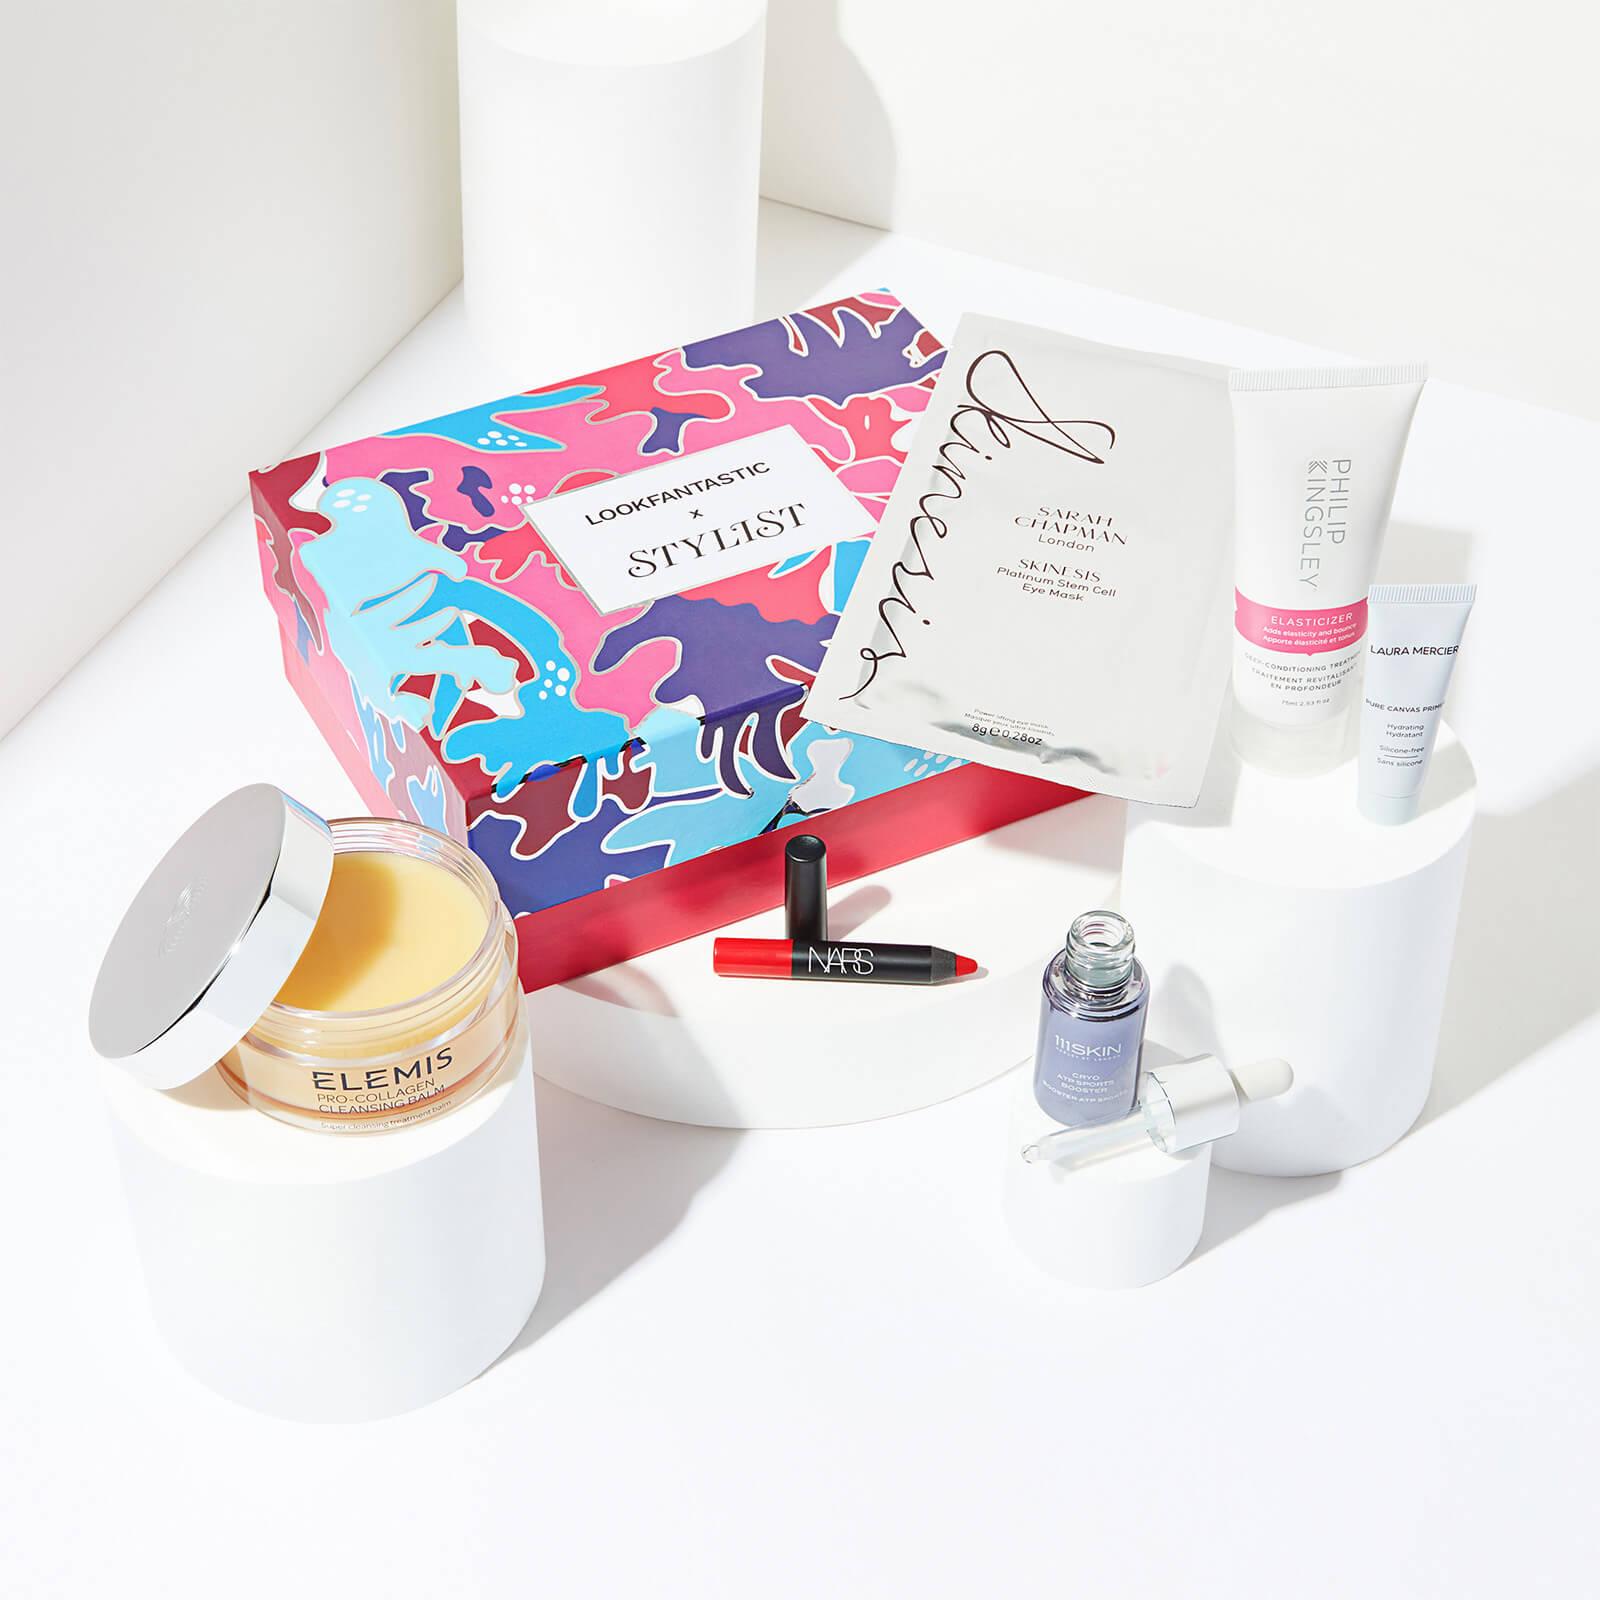 lookfantastic x stylist beauty box icangwp blog